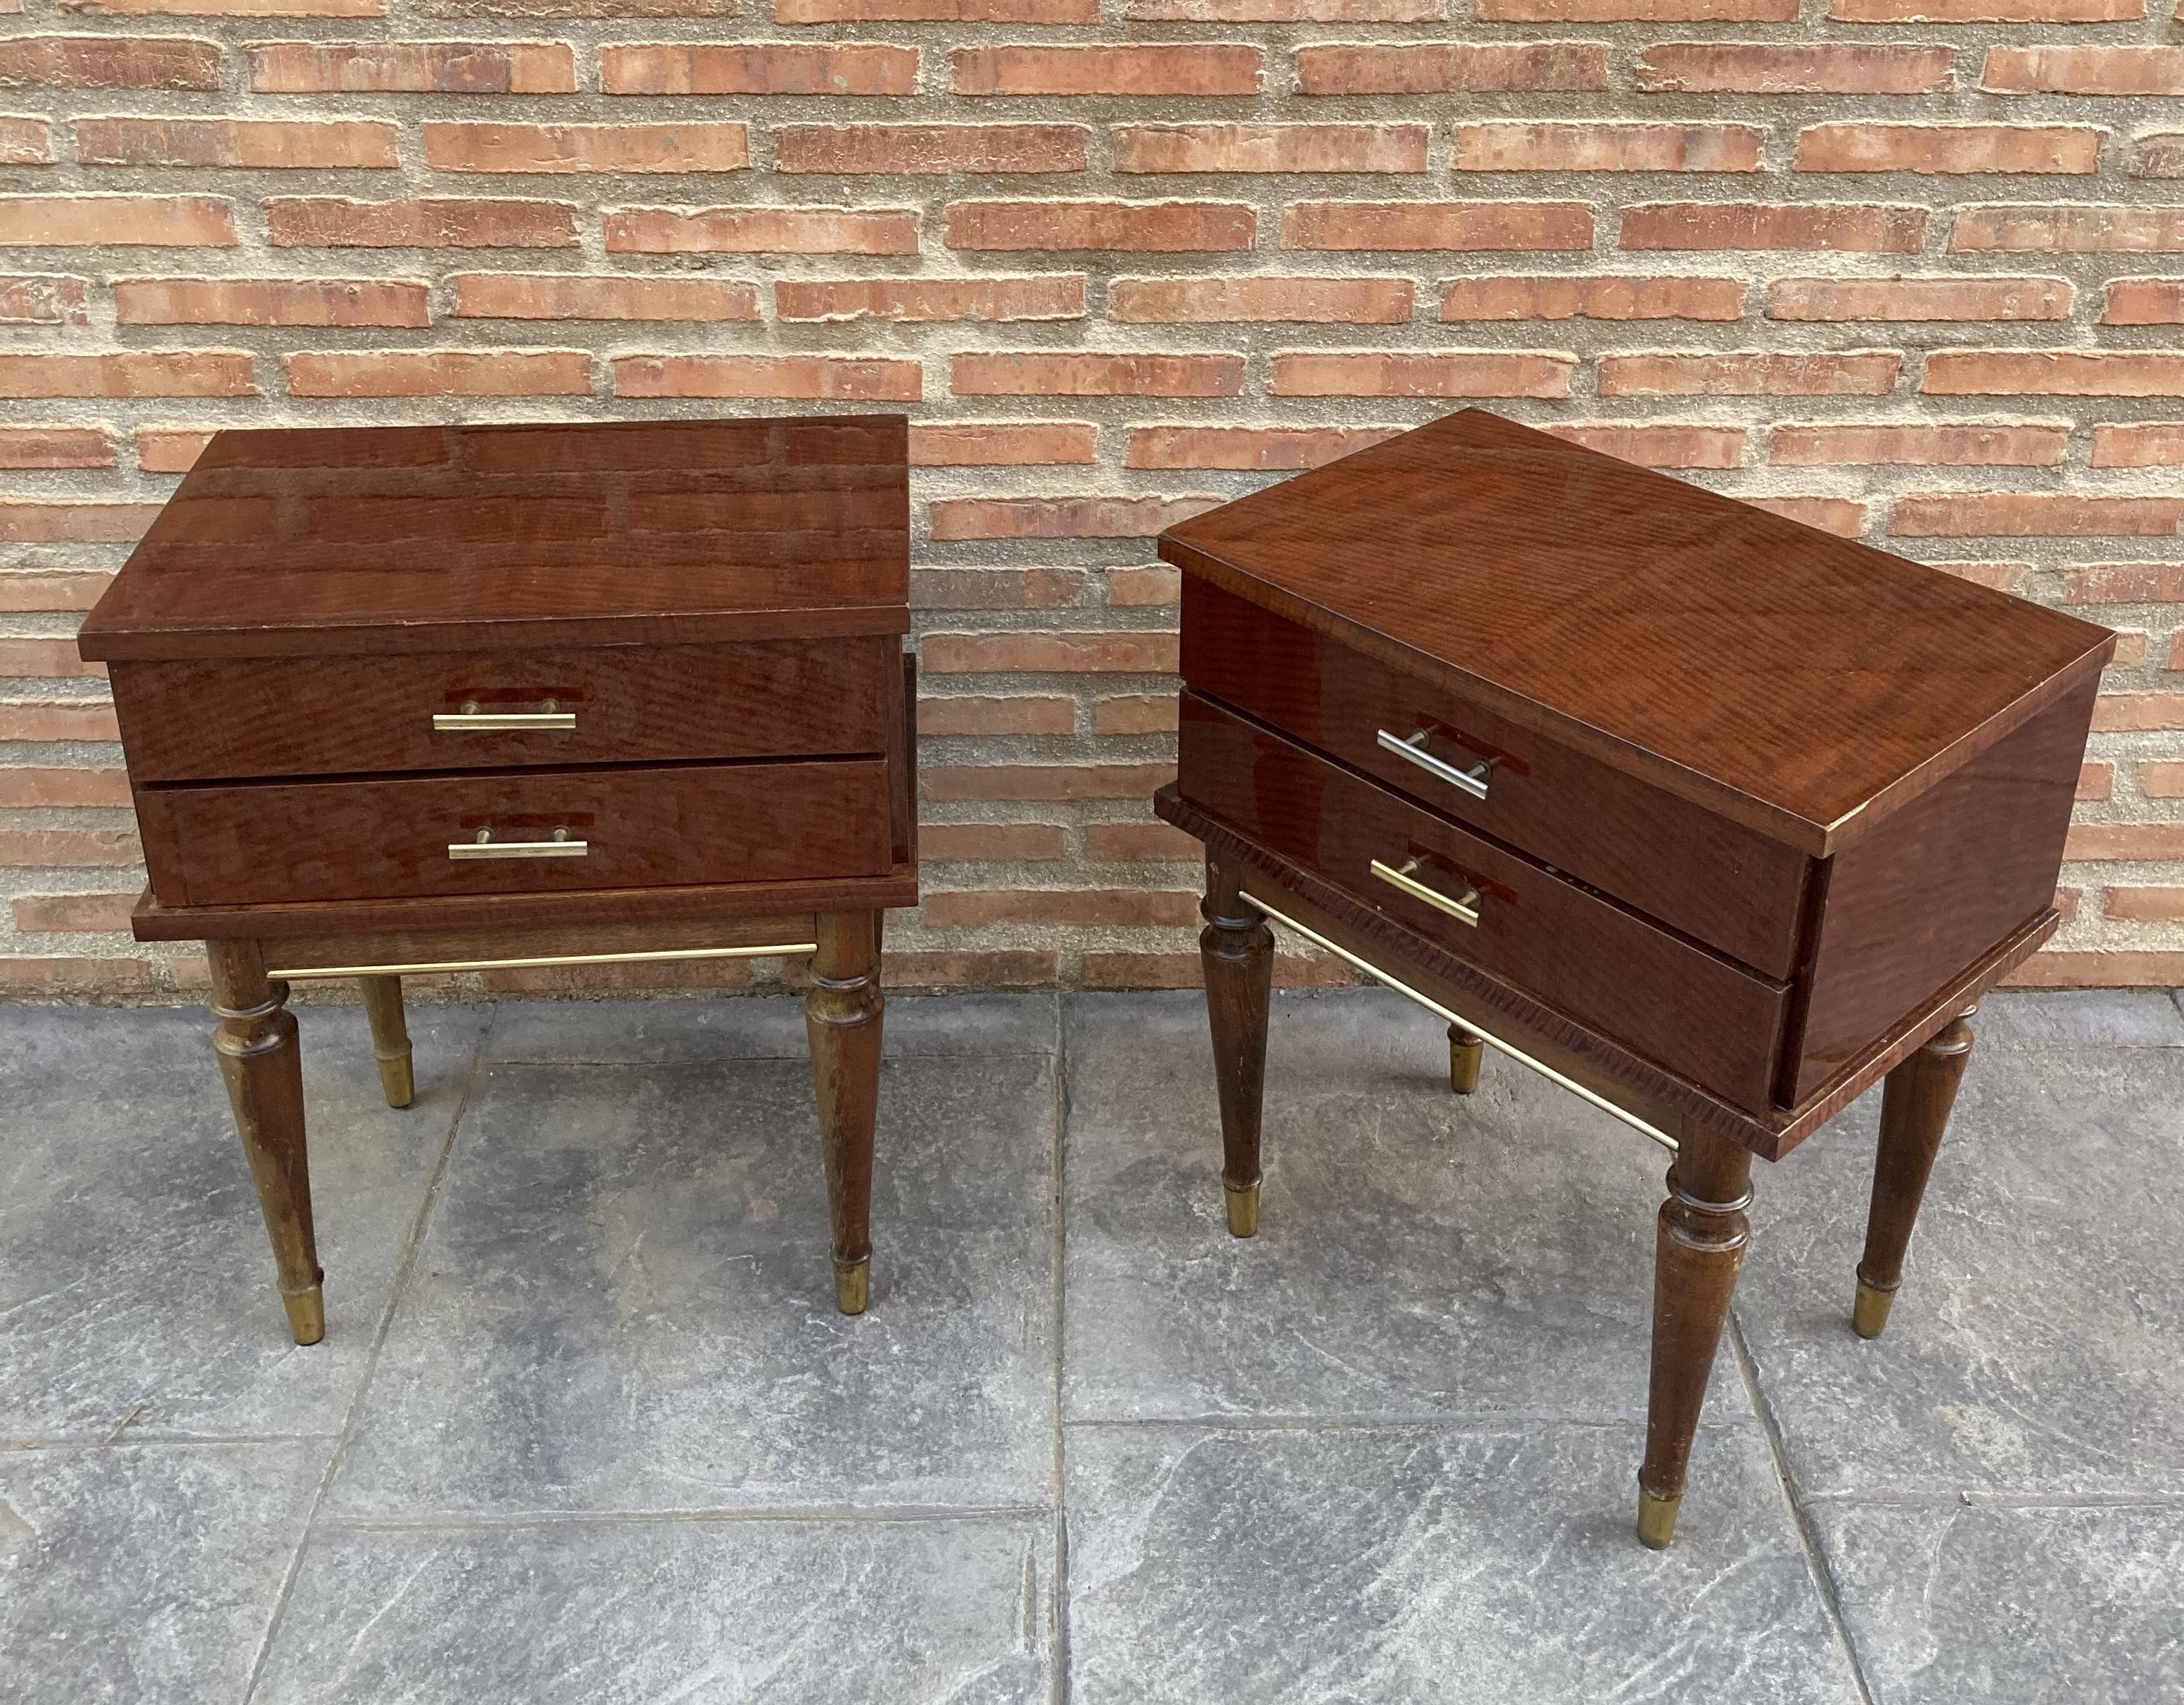 Vintage Wood Nightstands 1970s Set Of 2 Vinterior